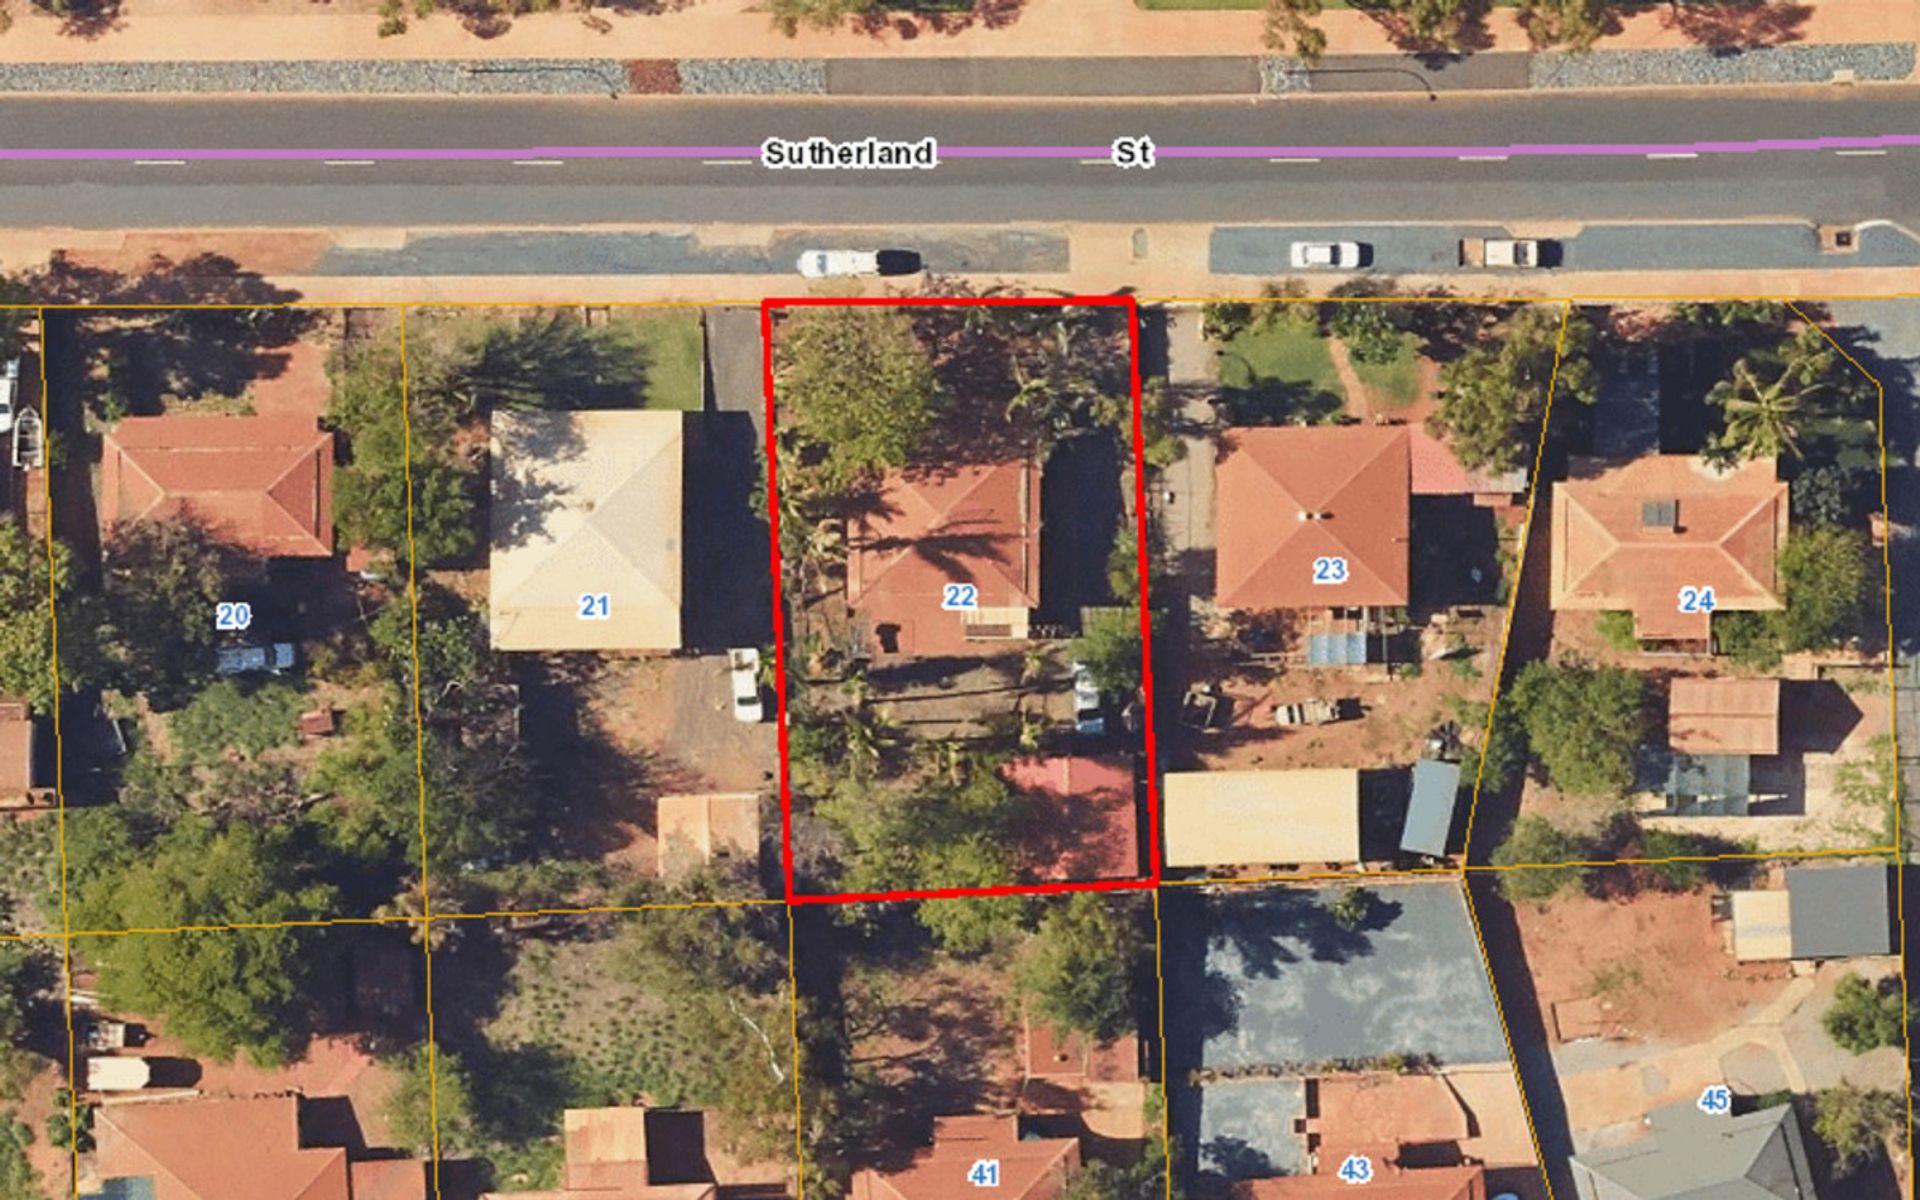 22 Sutherland Street, Port Hedland, WA 6721